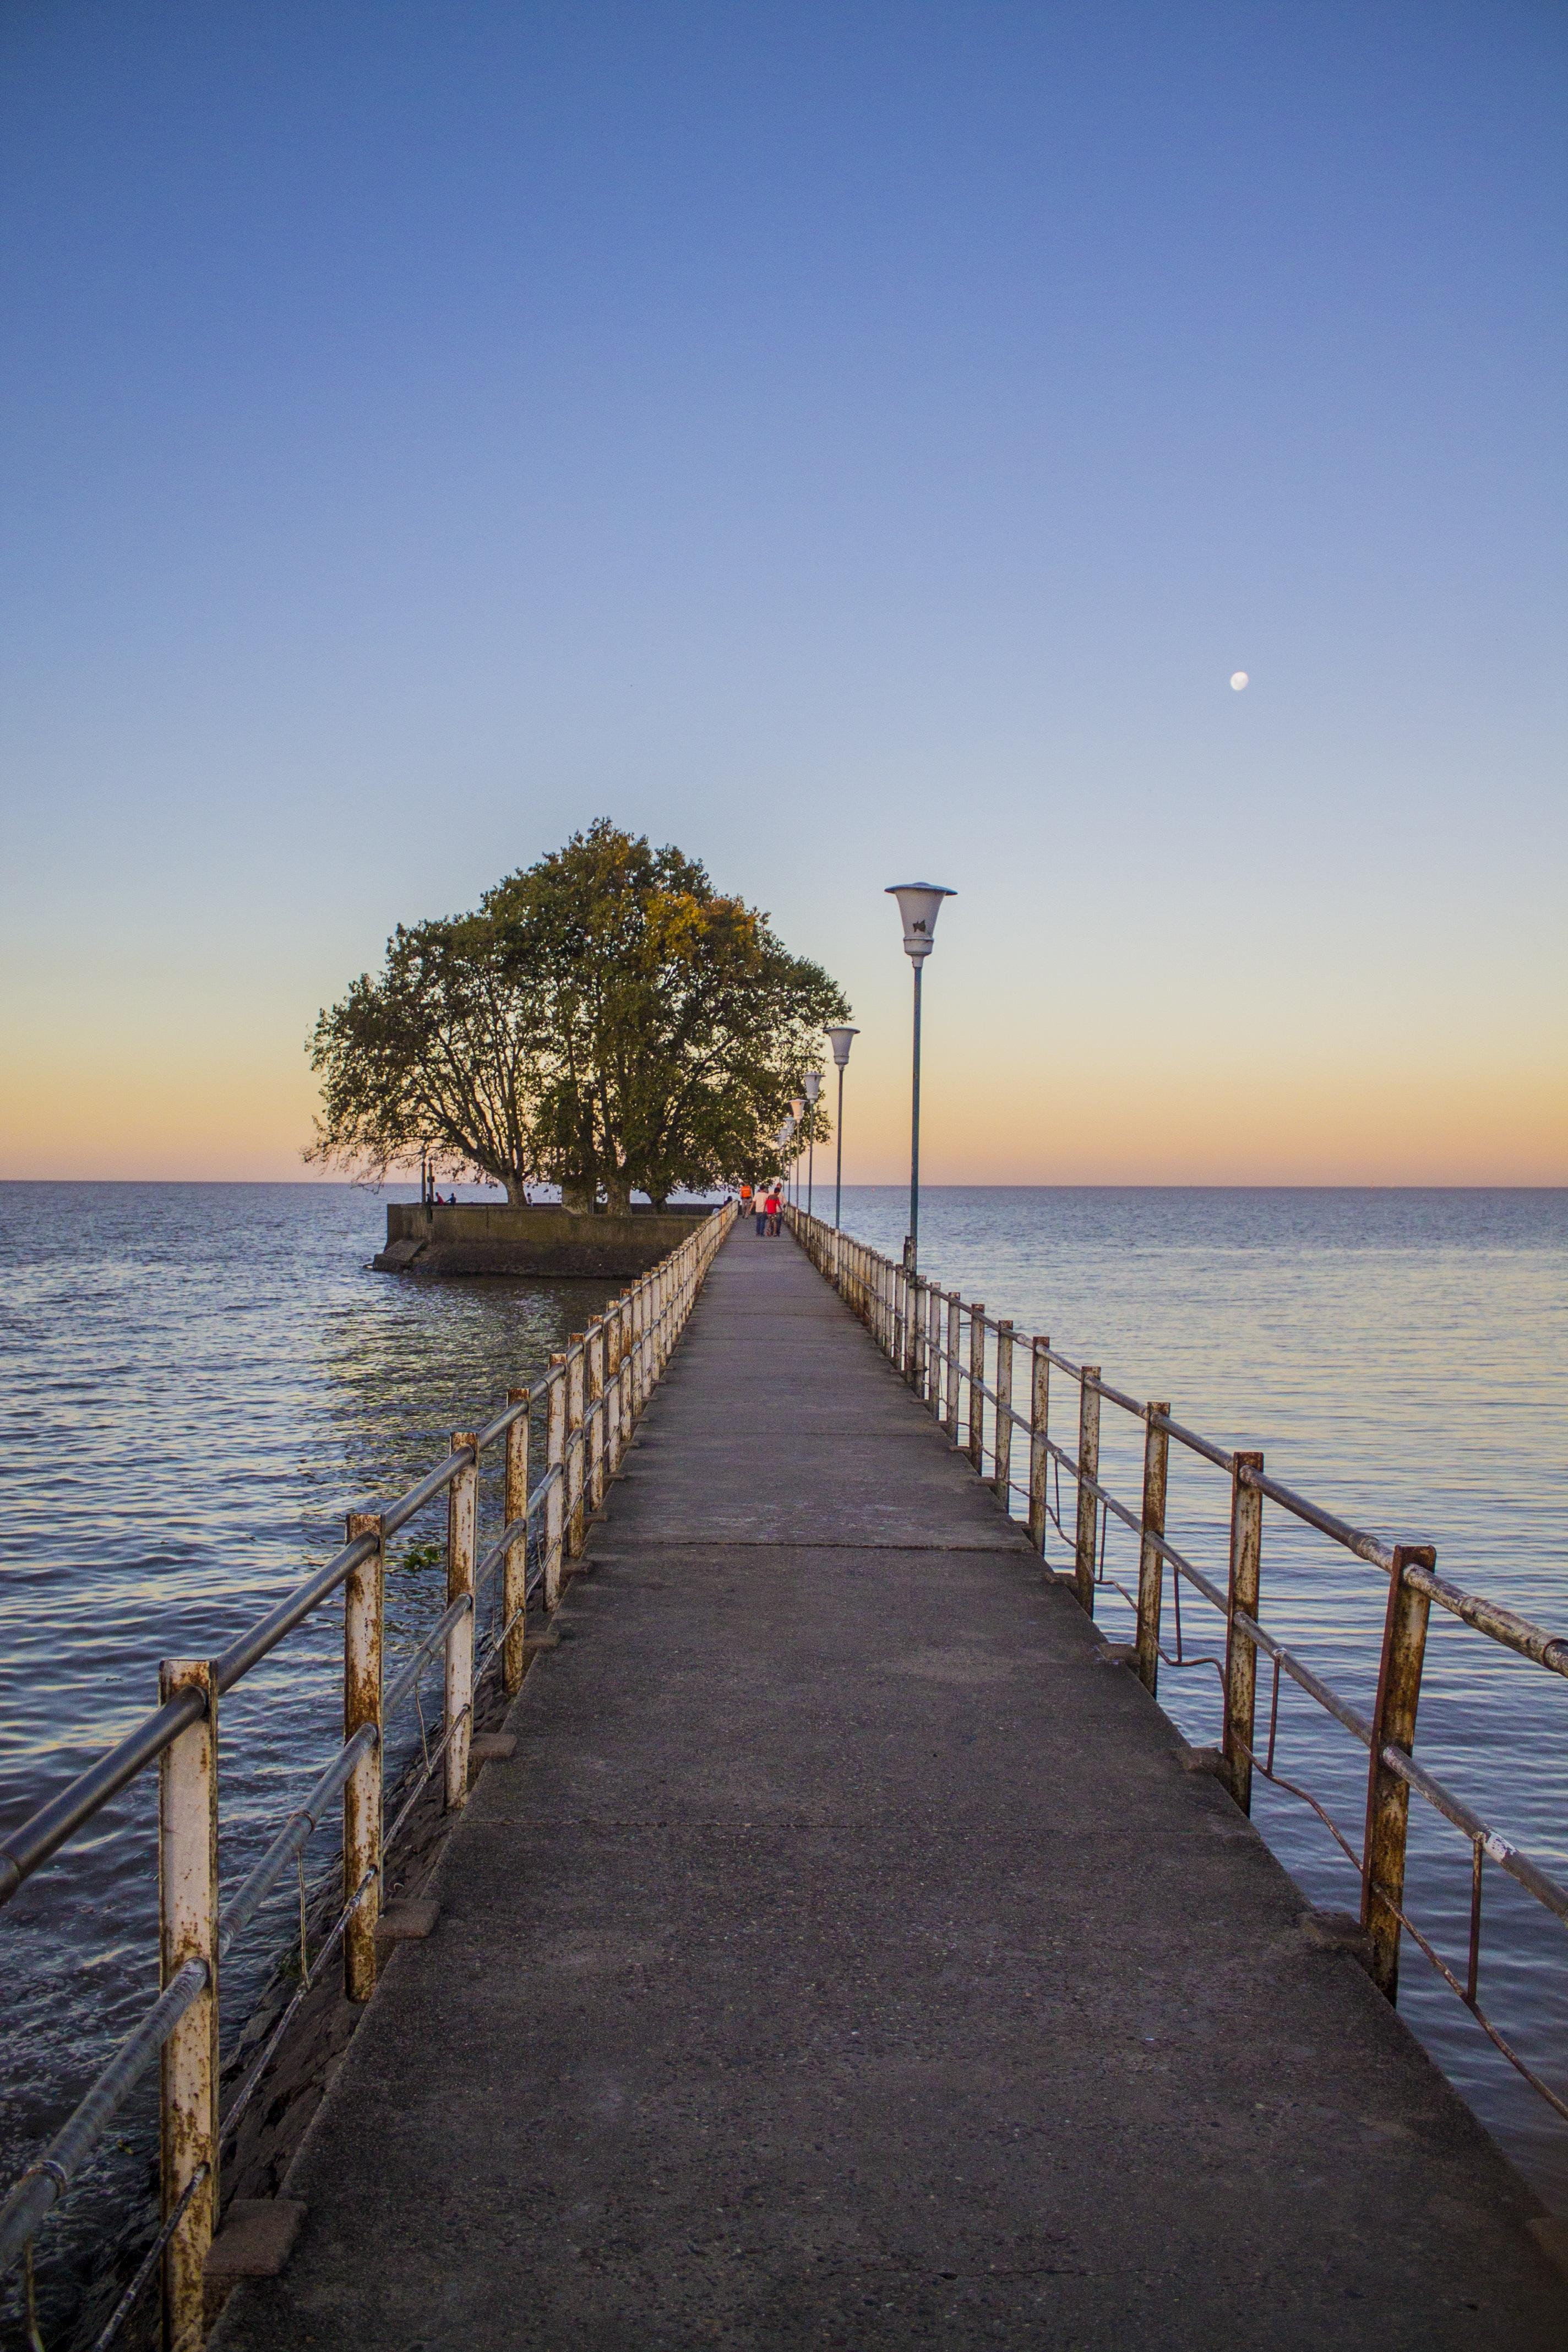 Free Images : Beach, Landscape, Sea, Coast, Tree, Nature